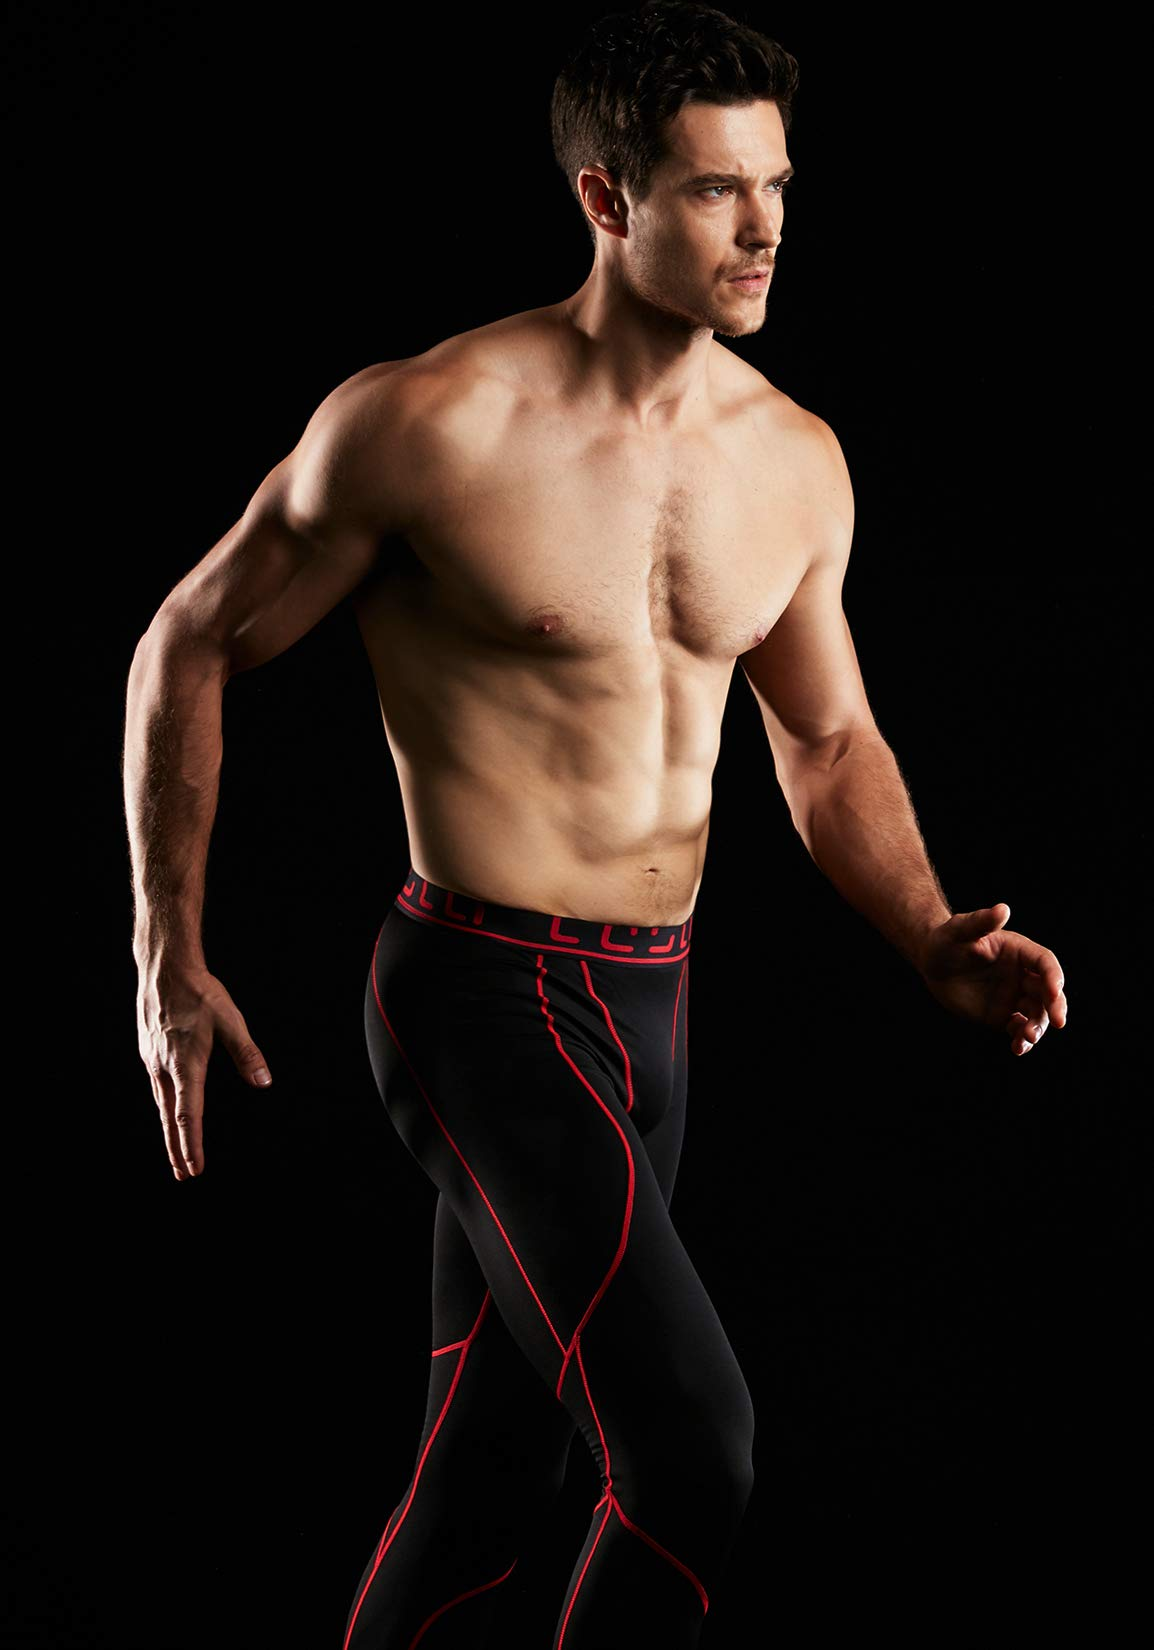 TSLA TM-YUP43-KKR_3X-Large Men's Emboss Pants Thermal Wintergear Compression Baselayer Sports Leggings YUP43 by TSLA (Image #4)